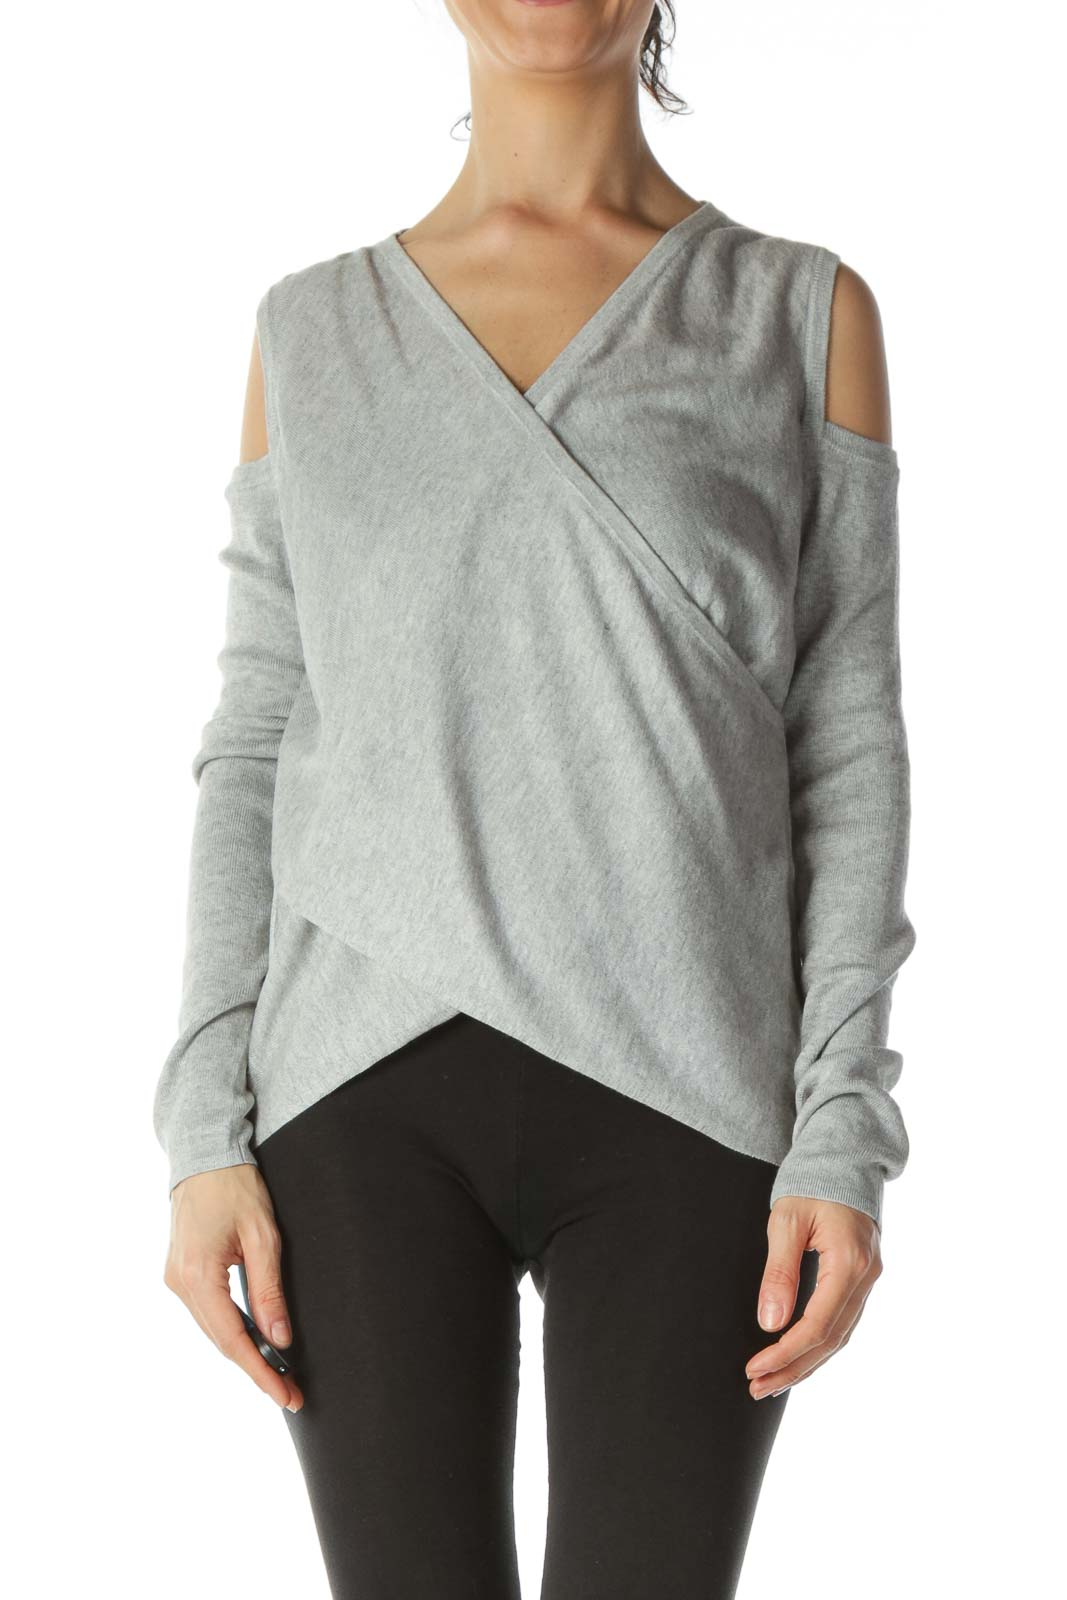 Grey Designer Silk Cashmere Knit Top Front